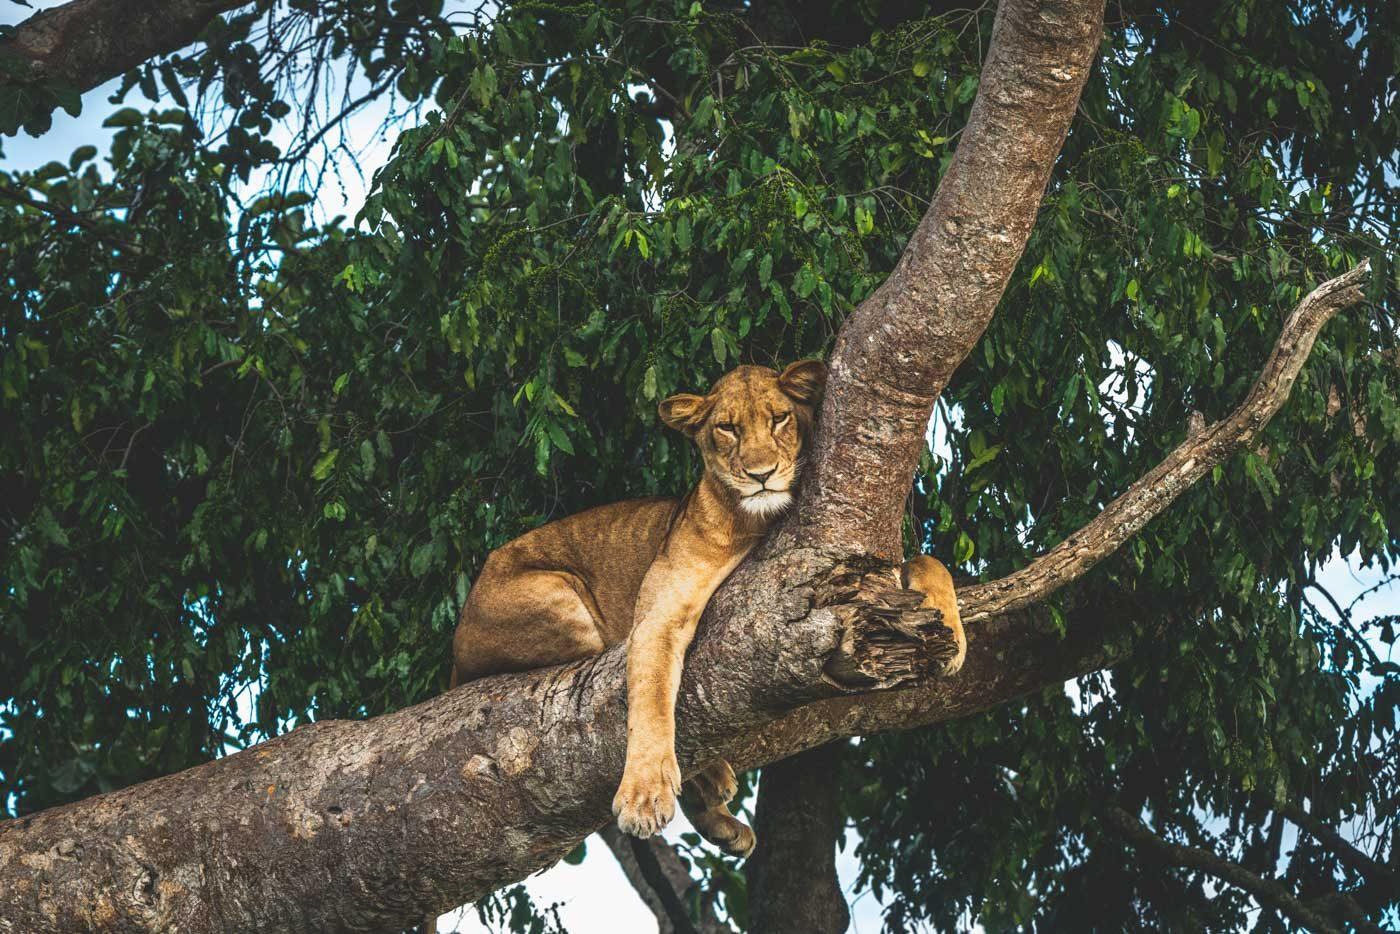 Tree climbing lion in Queen Elizabeth National Park, Uganda